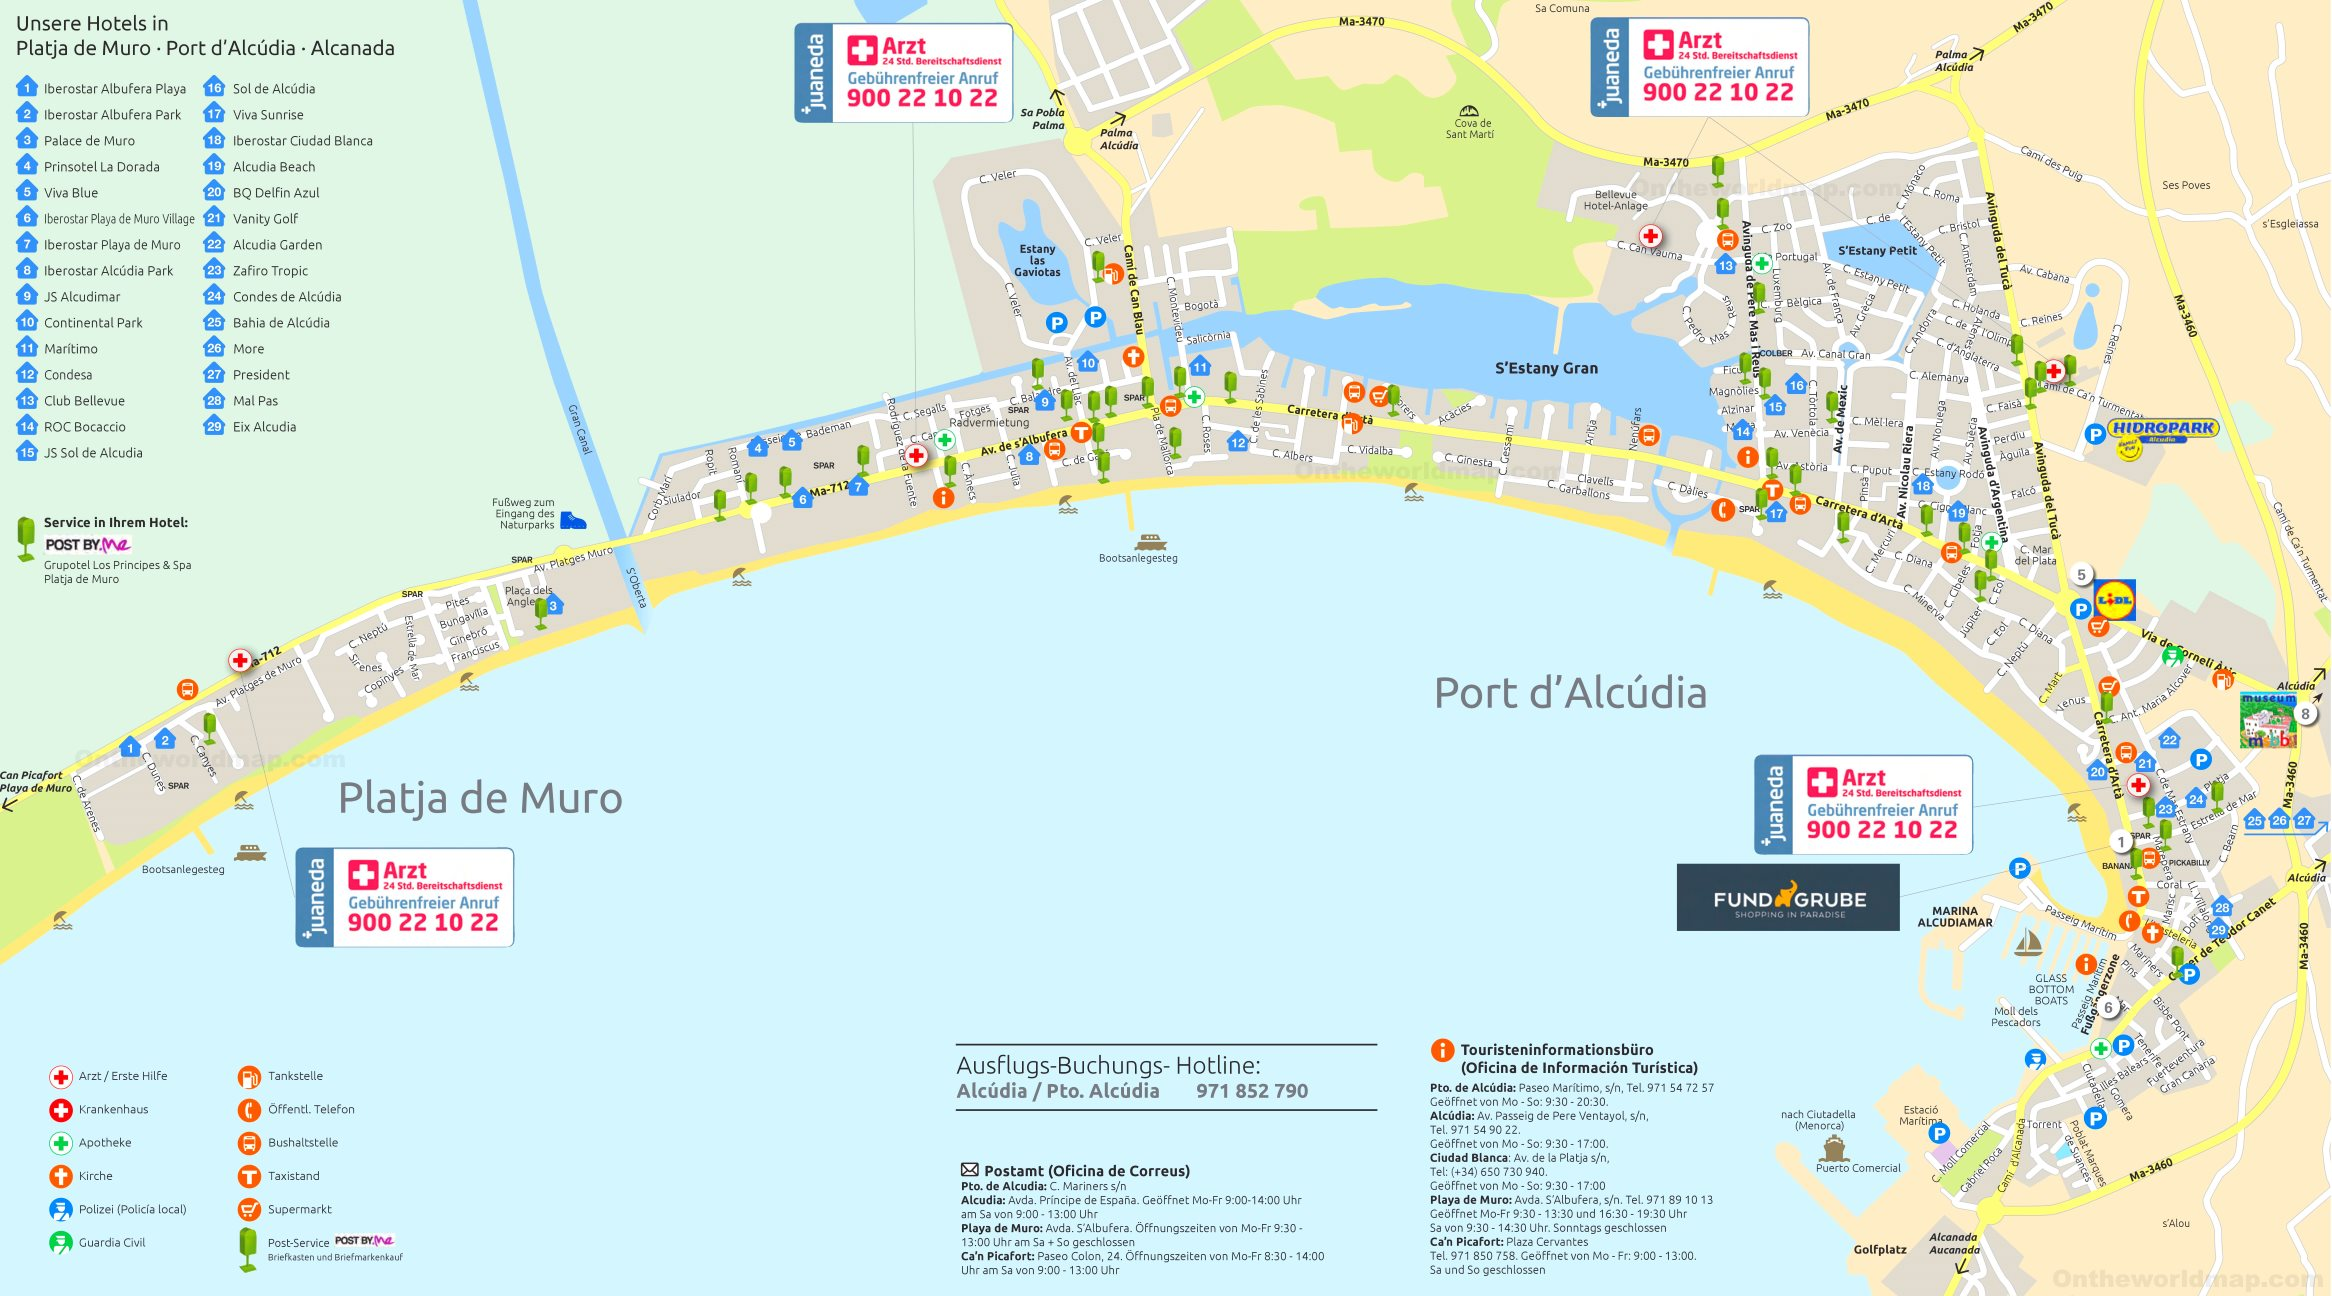 Playa De Muro Karte.Port D Alcudia And Playa De Muro Map